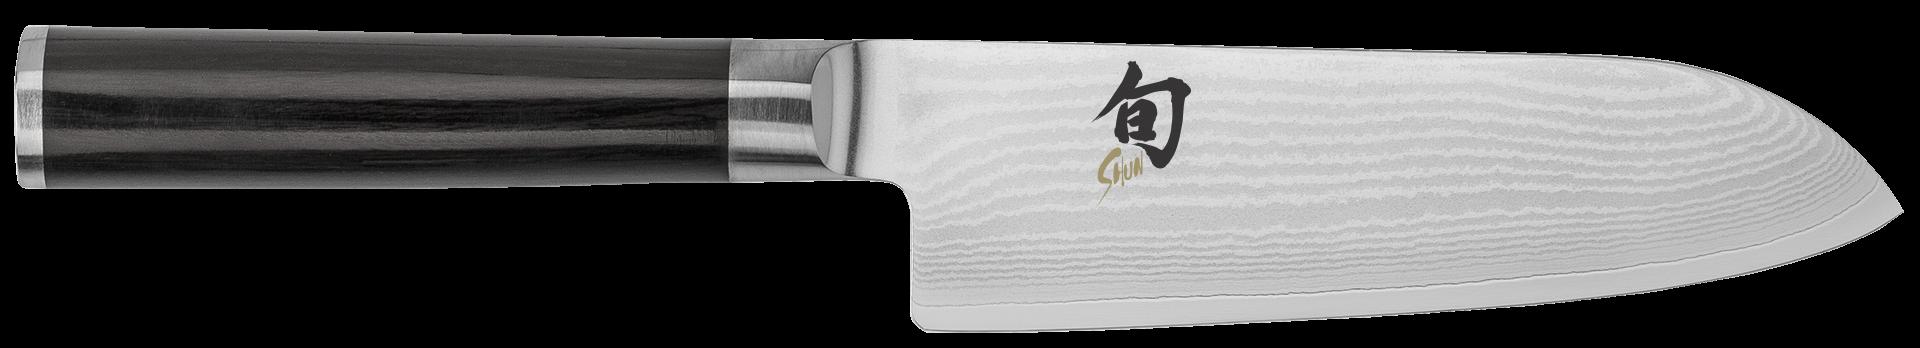 Shun Classic 5 1/2 Santoku Knife